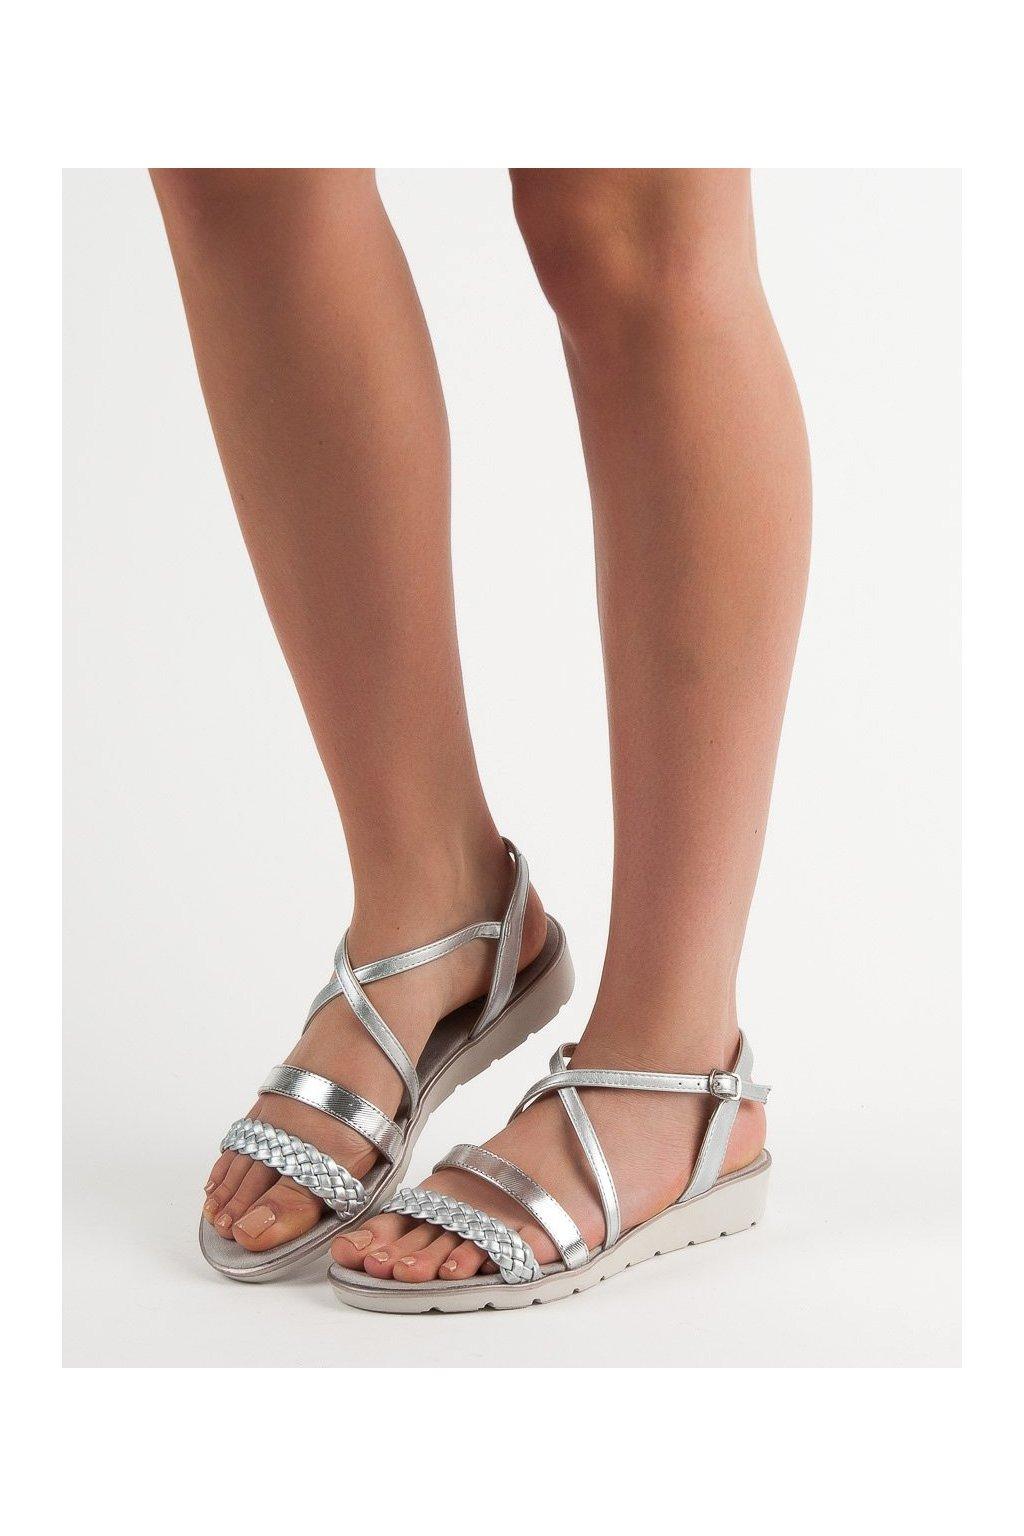 Sivé sandále Kylie NJSK K1915005PL